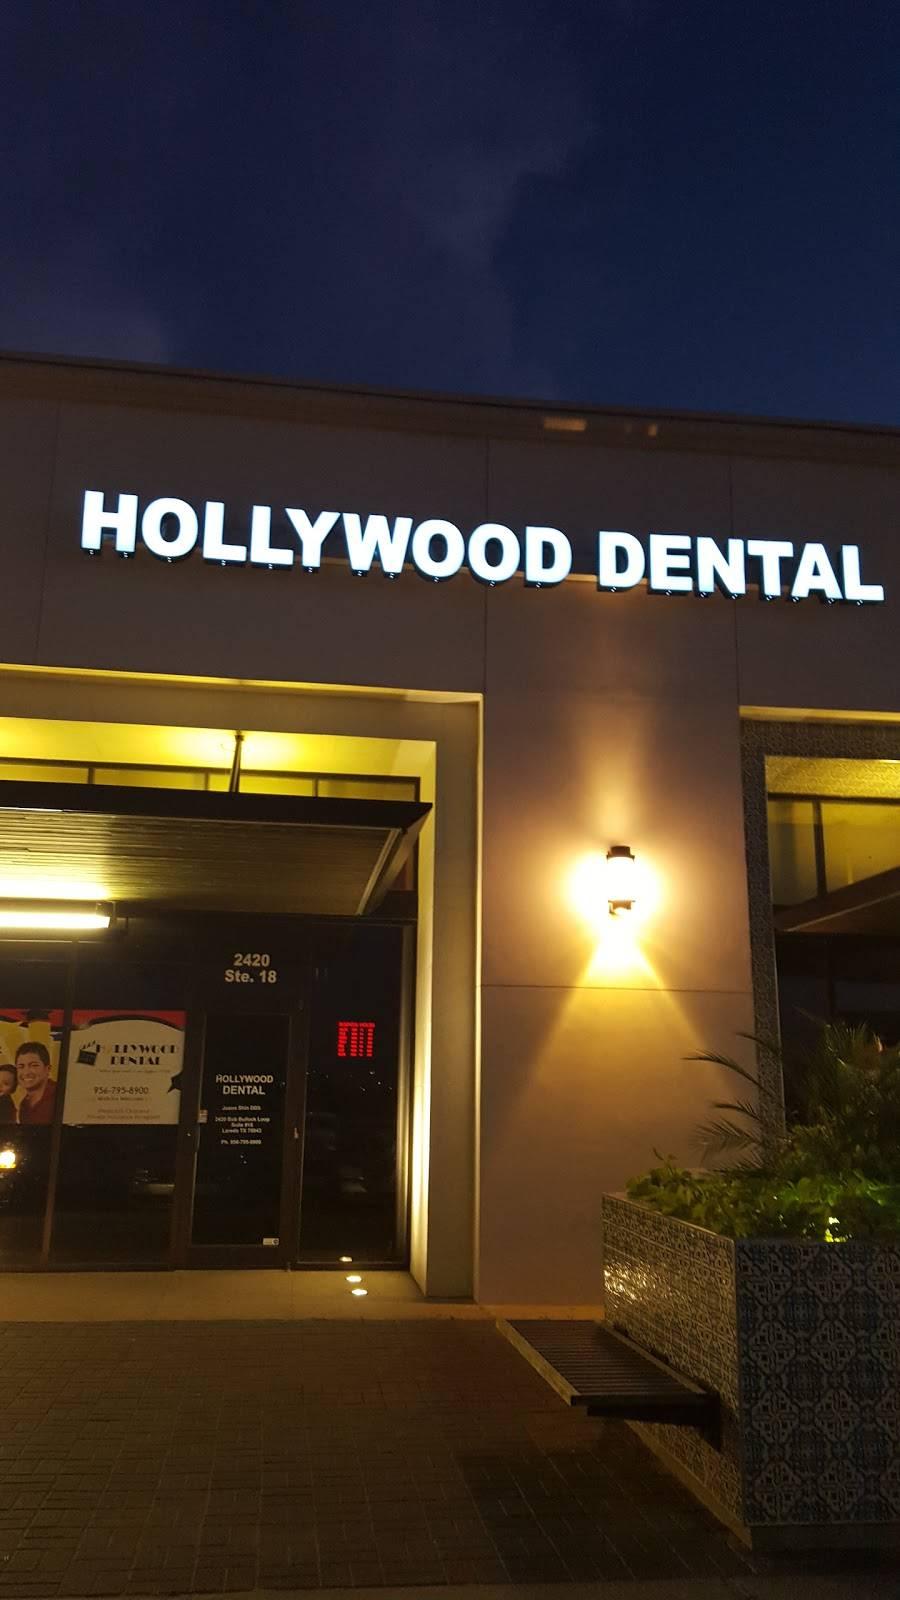 HOLLYWOOD DENTAL - dentist  | Photo 3 of 5 | Address: 2420 Bob Bullock Loop #18, Laredo, TX 78043, USA | Phone: (956) 795-8900